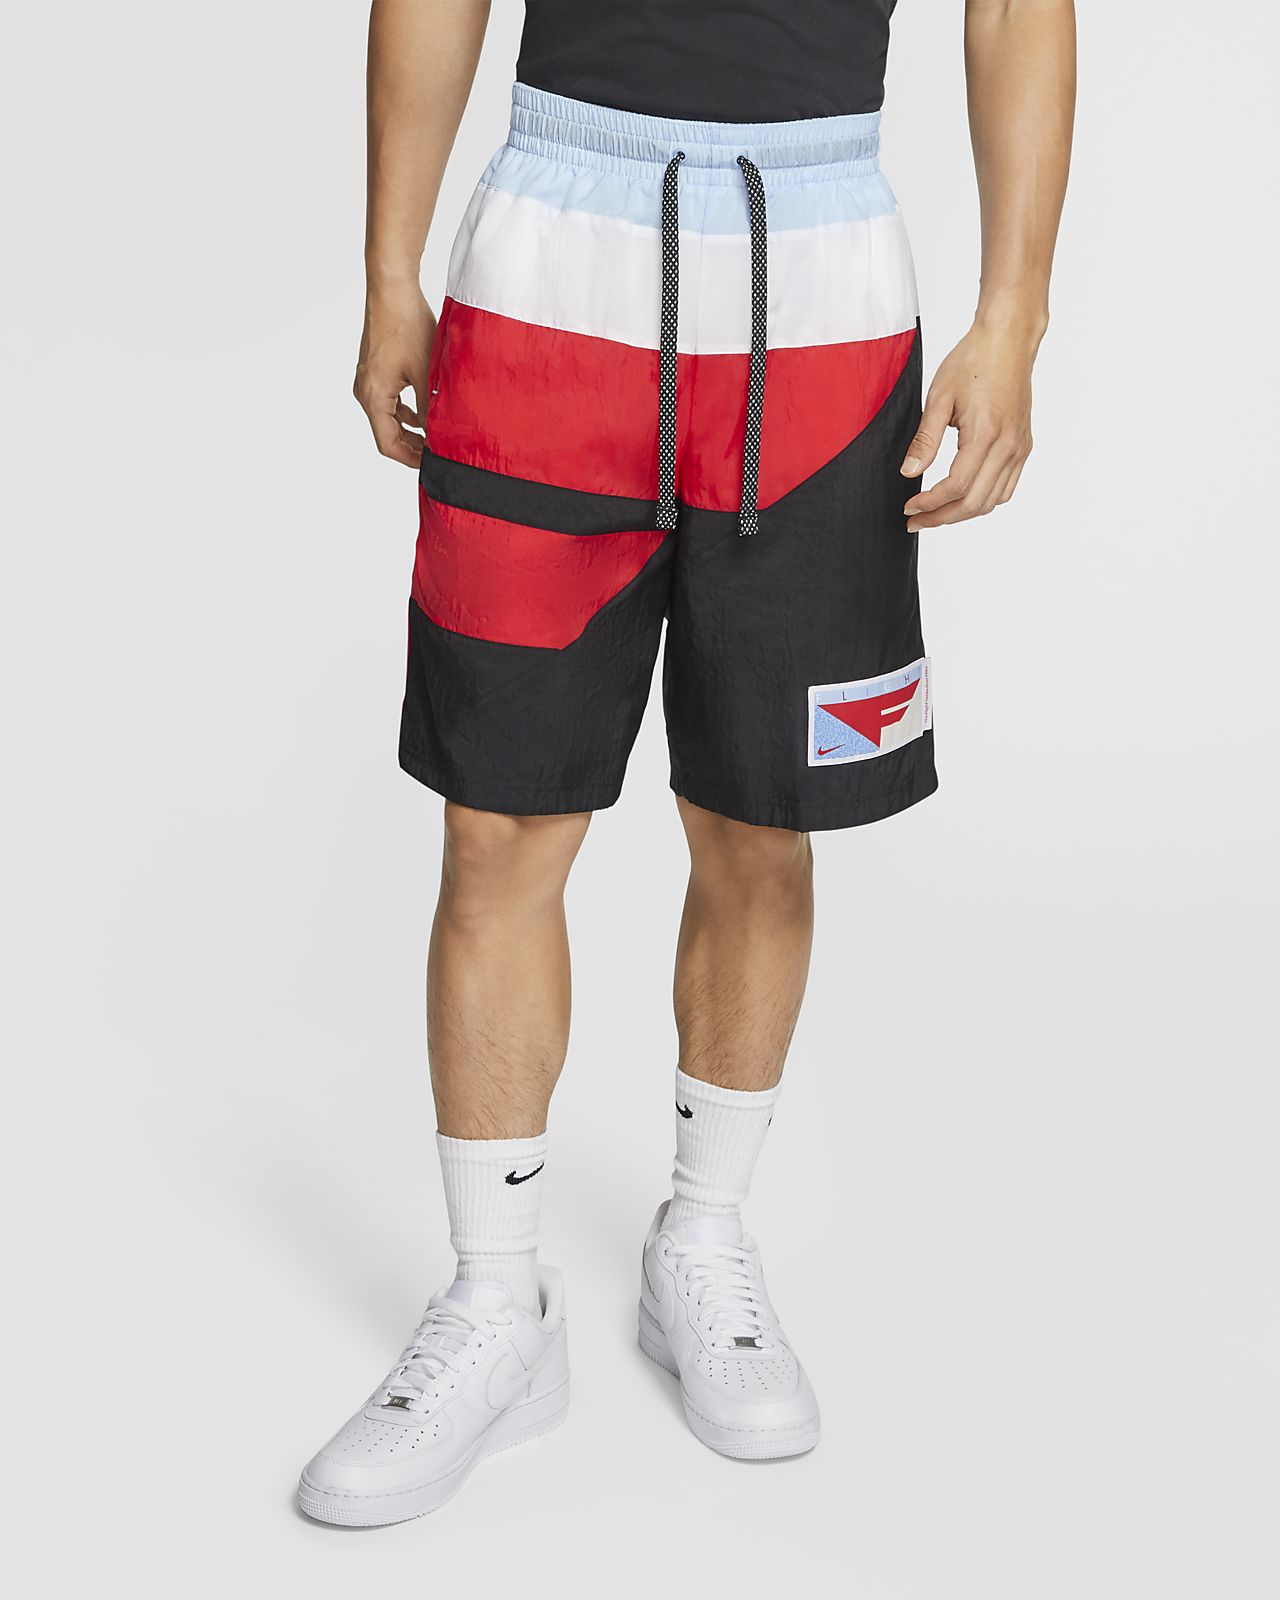 Nike Flight Men's Basketball Shorts